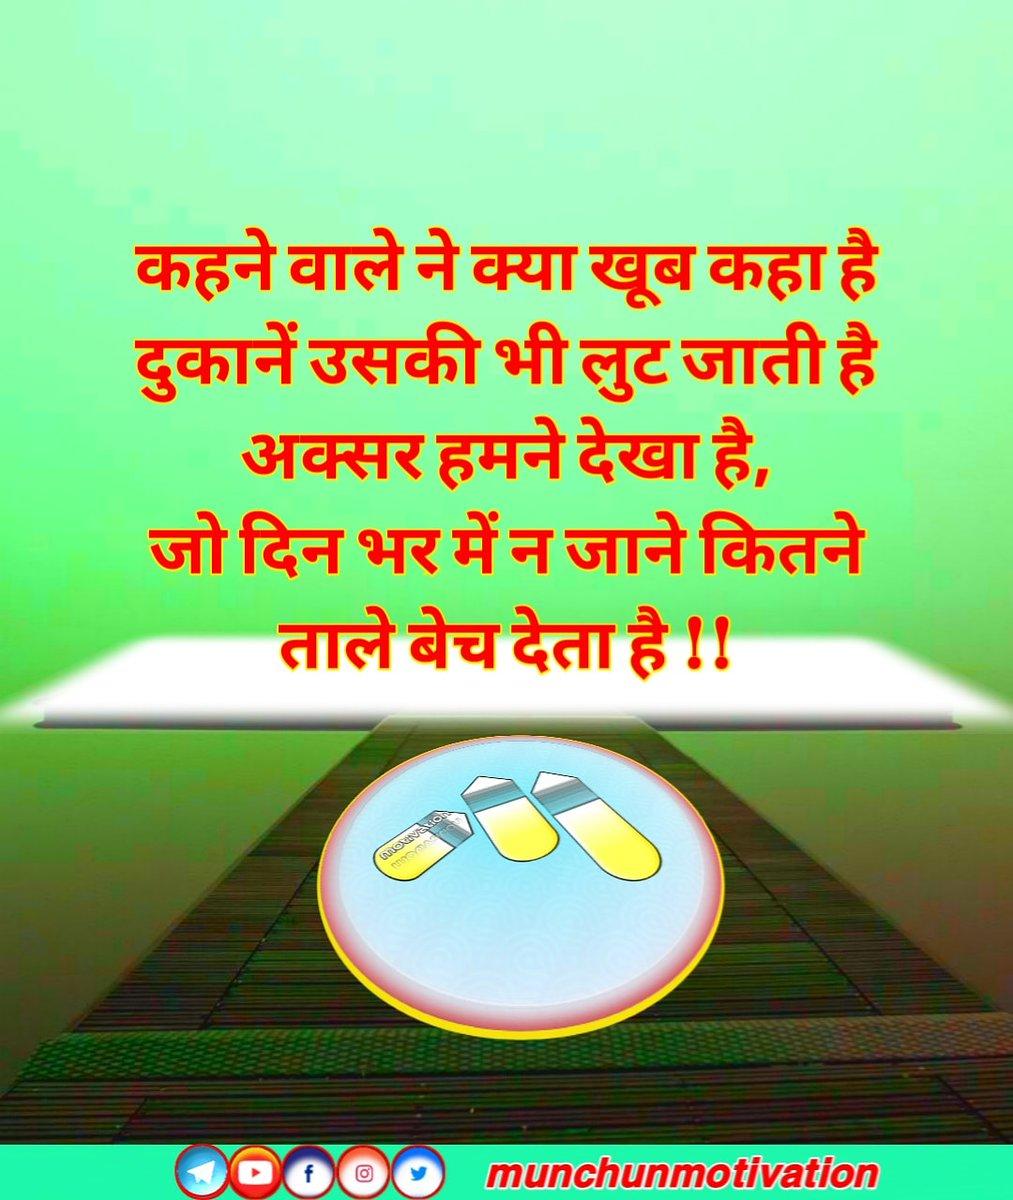 Motivation Quotes. #goodmorning #goodmorningpost #motivationquote #motivation #munchunmotivate #bestquotes #bestmotivation #suvichar #lifelesson #life #sikh #bestmotivationalquotes #motivationalquotes #indianmotivation #hindimotivationalquotes #hindimotivationpic.twitter.com/ht48BaEidv